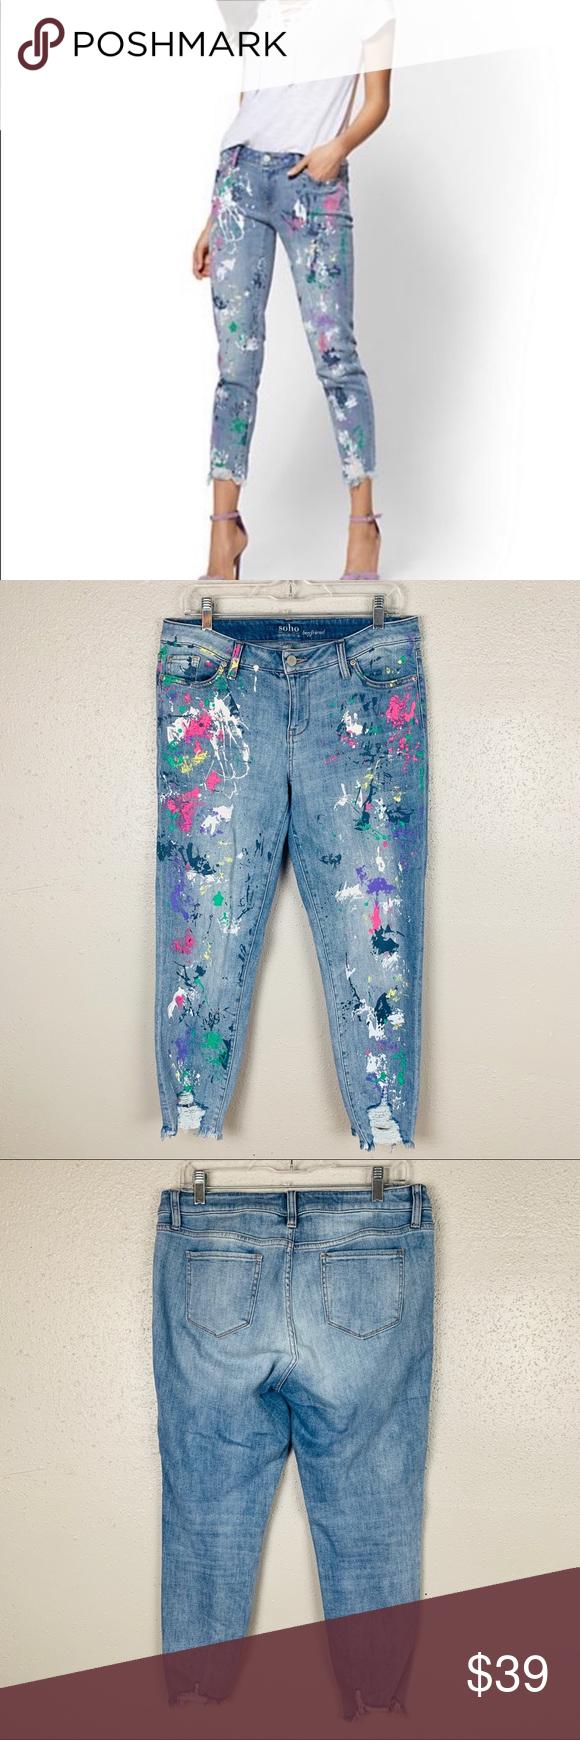 Pilcro Mid-Rise Paint Splattered Slim Boyfriend Jeans